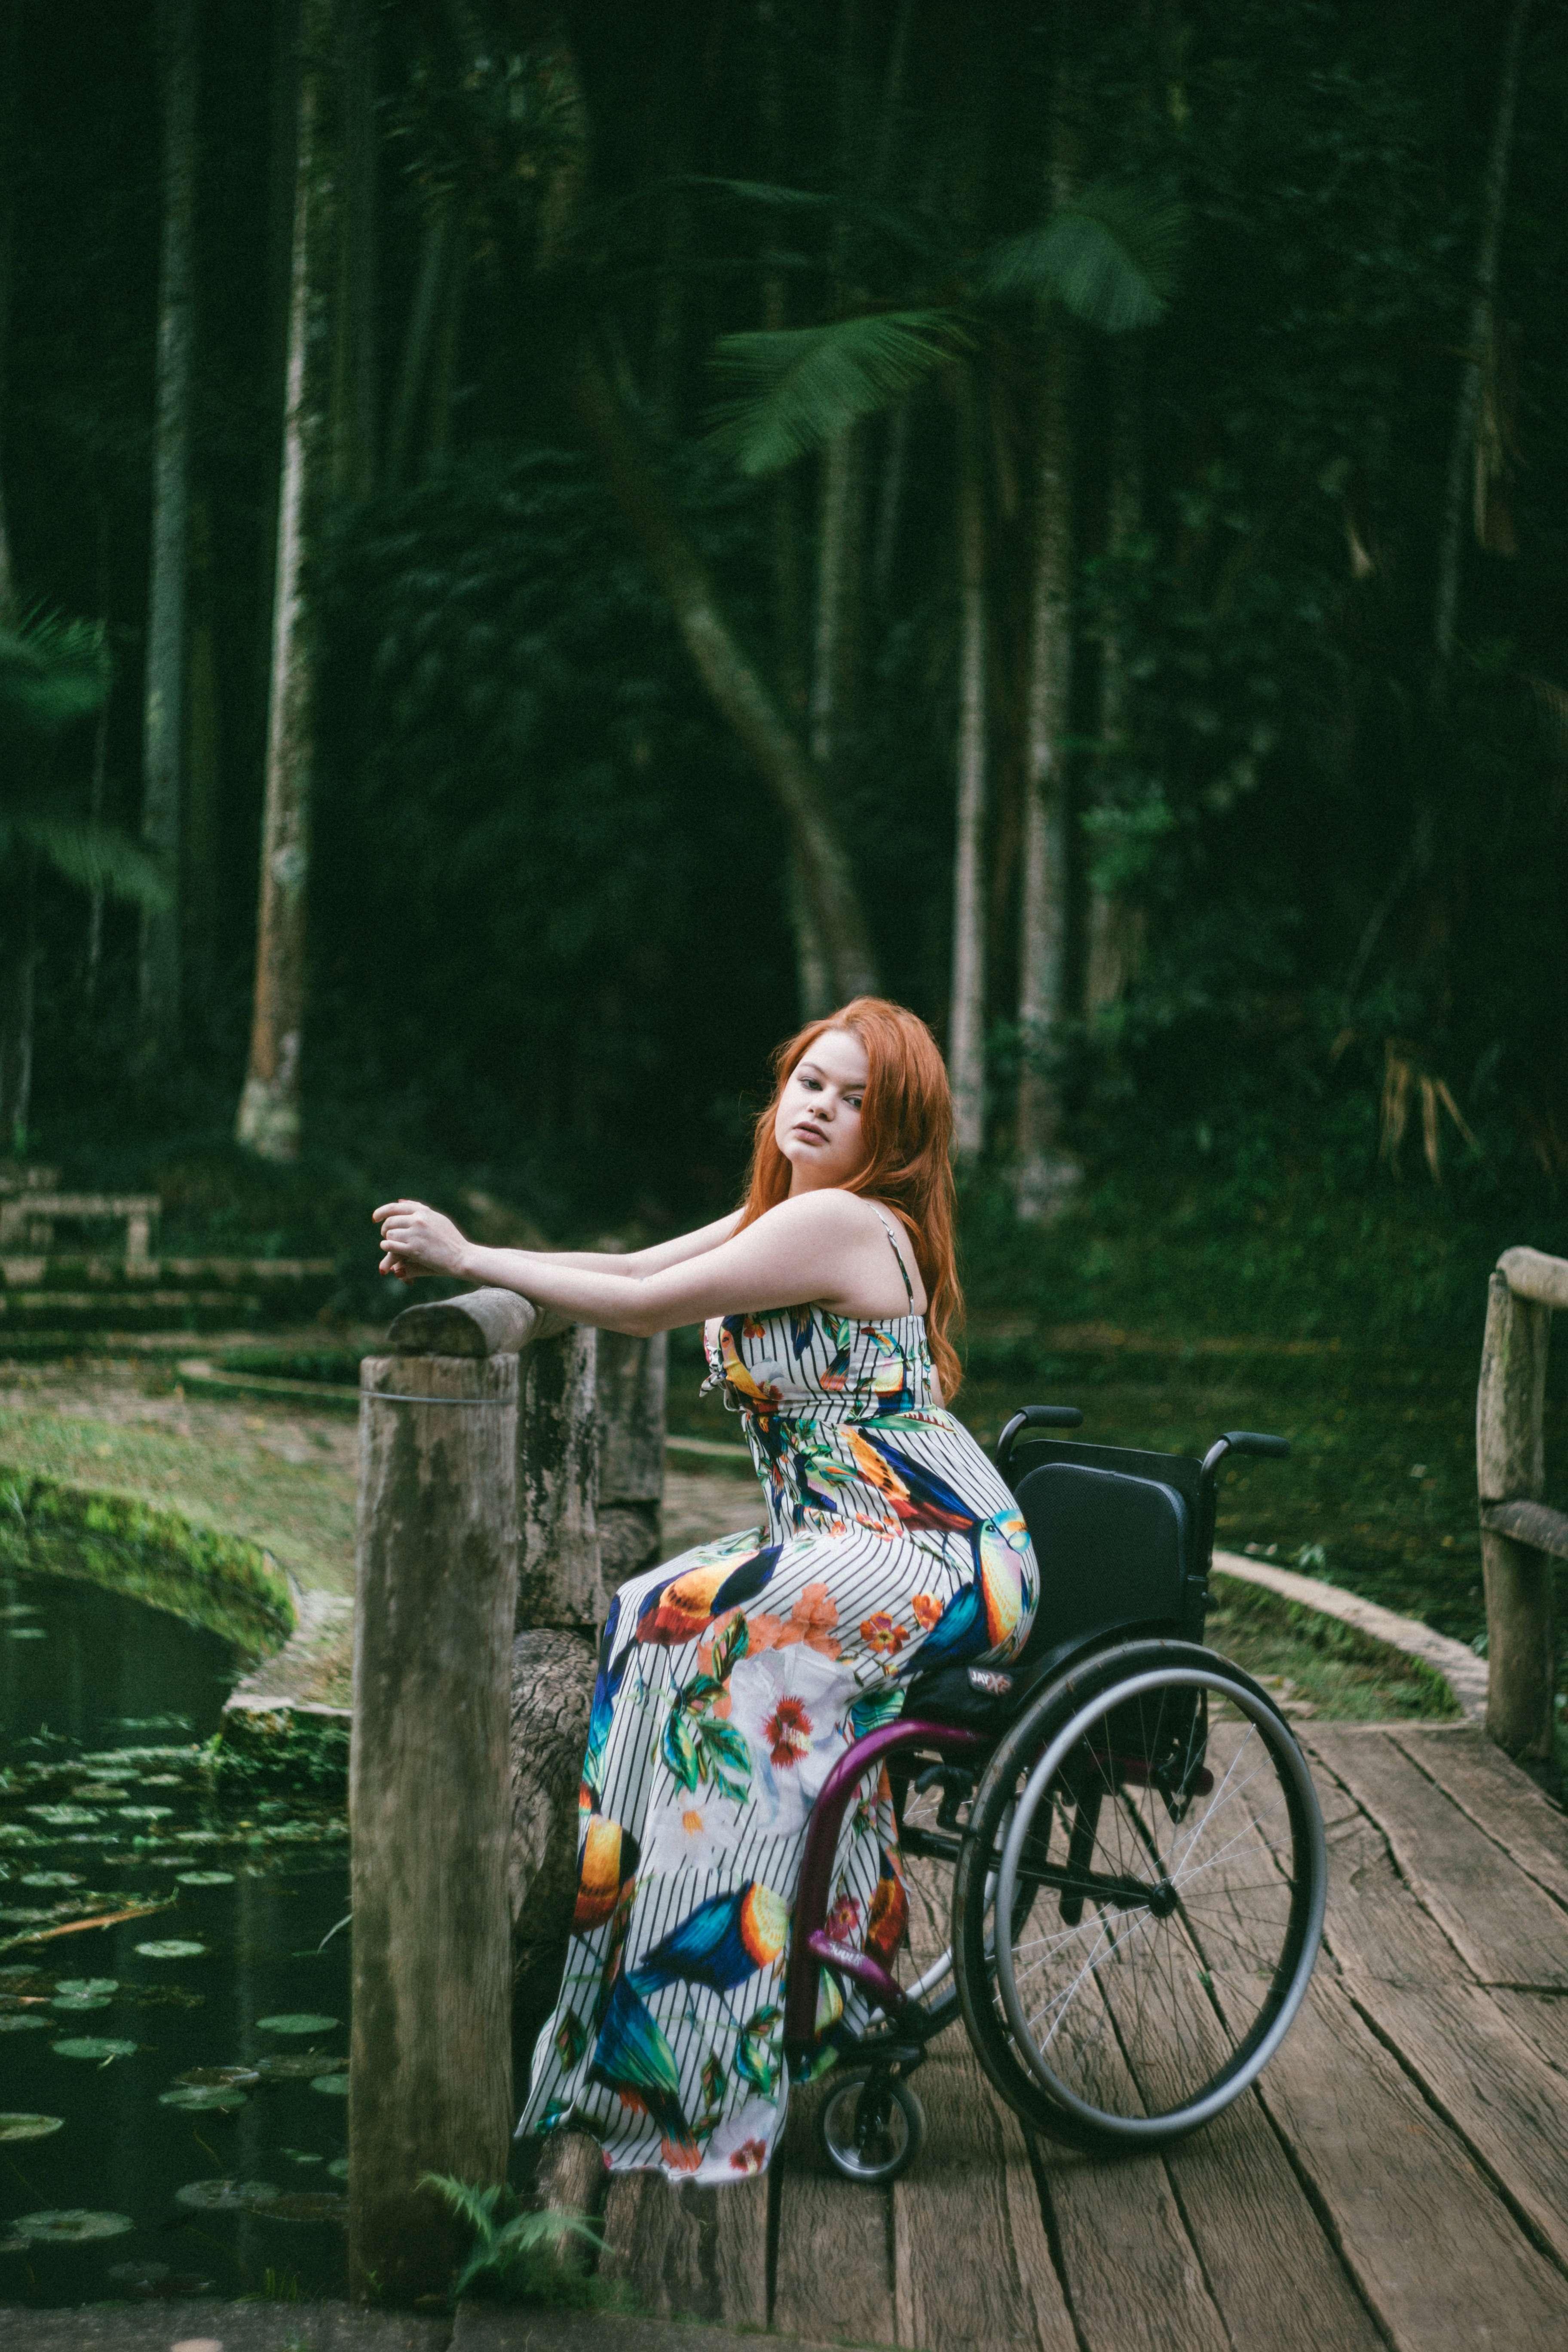 Fotógrafa cadeirante faz ensaios inclusivos